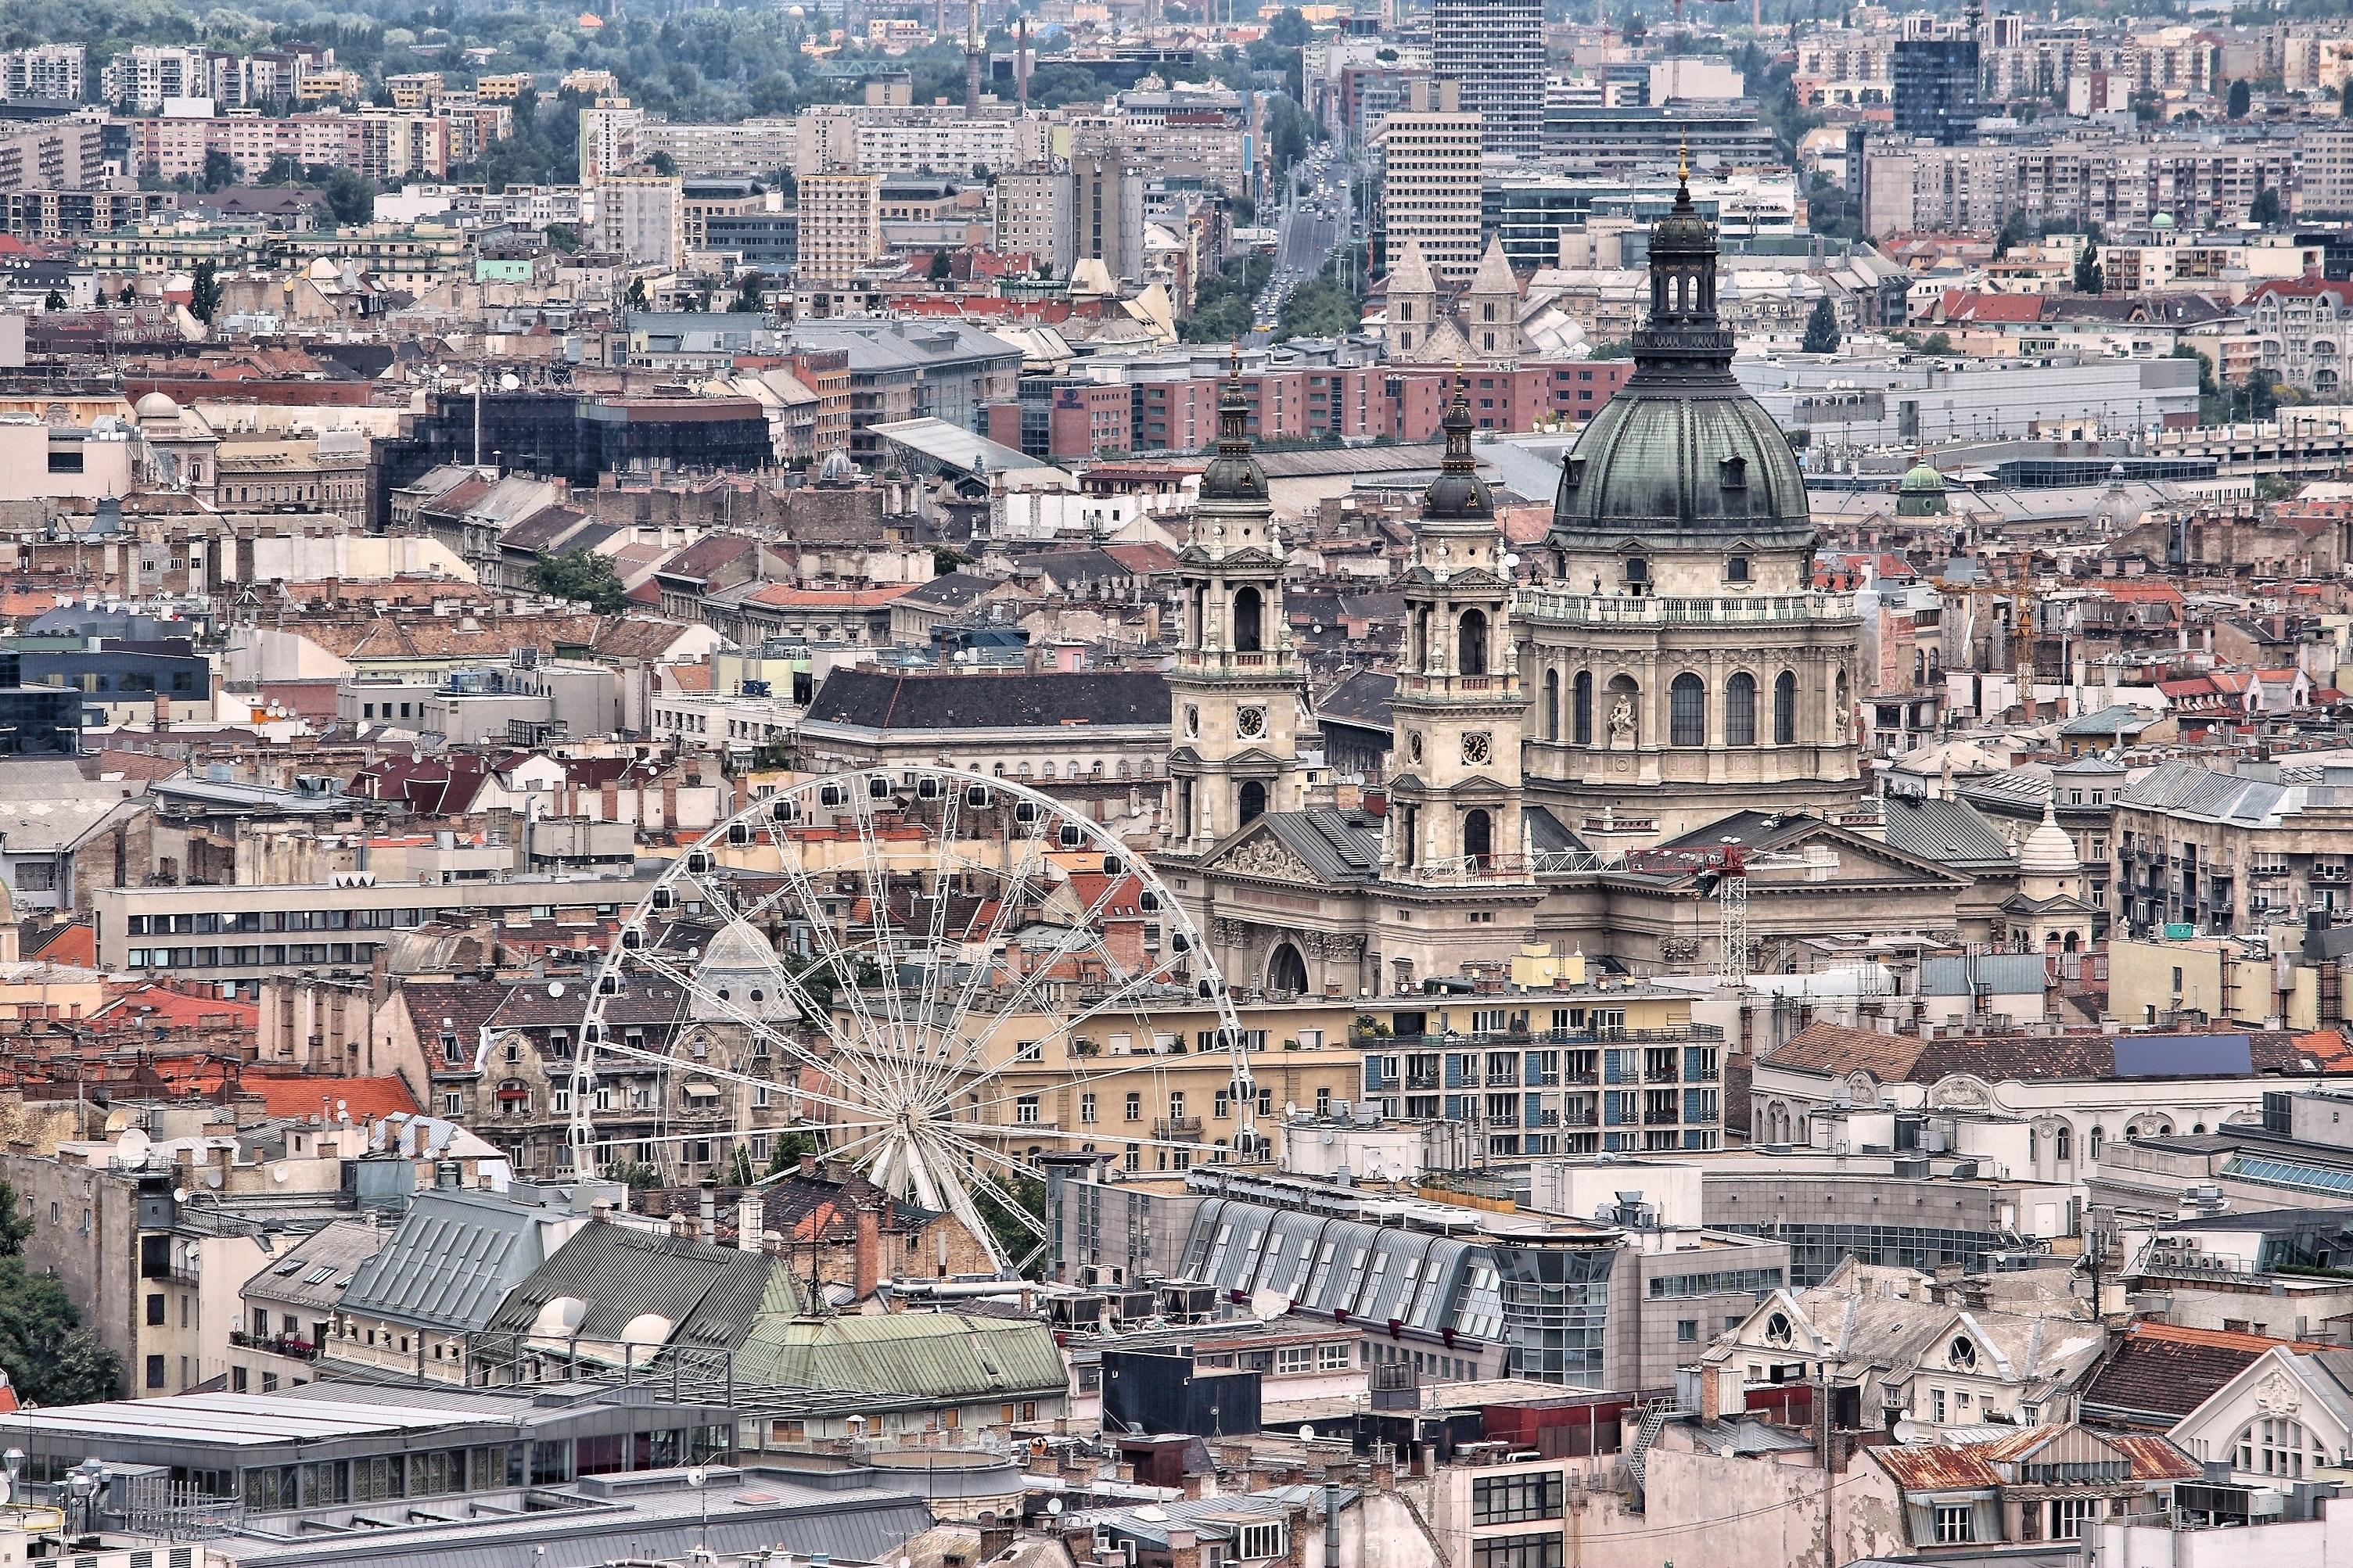 Pest Side • Budapest, Hungary